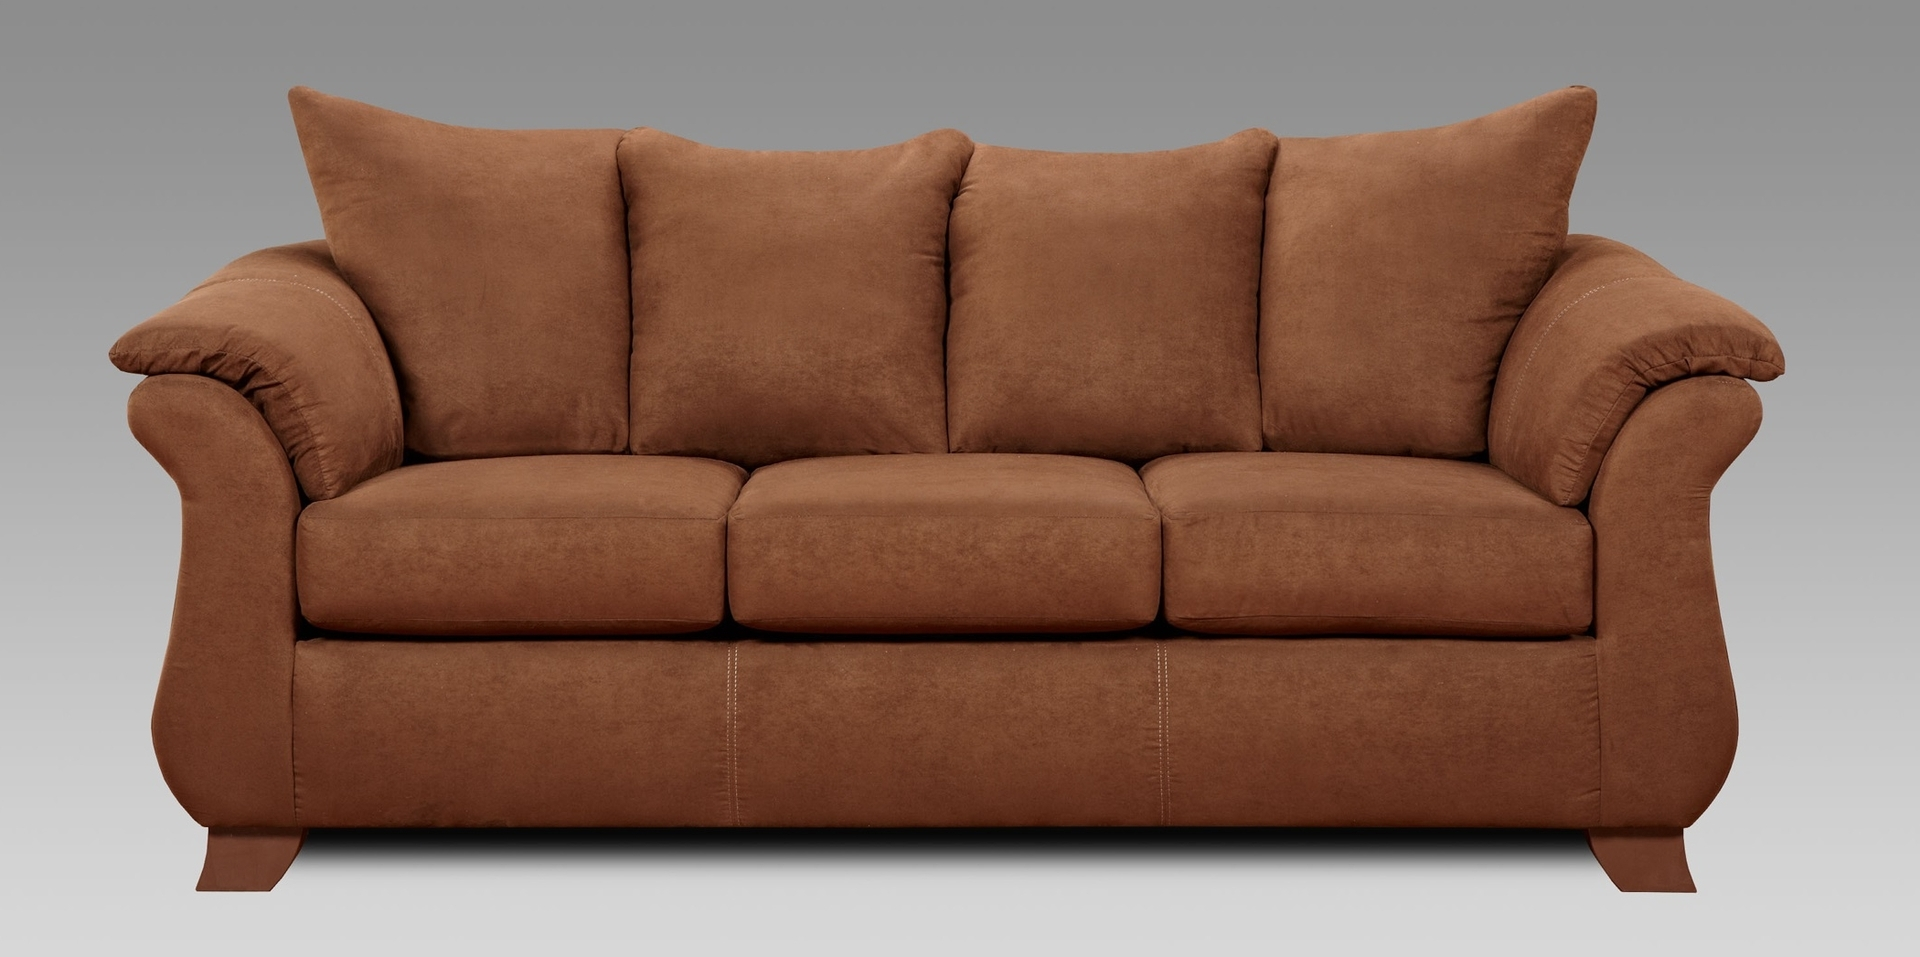 Tuscaloosa Sectional Sofas Pertaining To Widely Used Sofas: Tuscaloosa, Al: Southeastern Furniture (View 10 of 15)